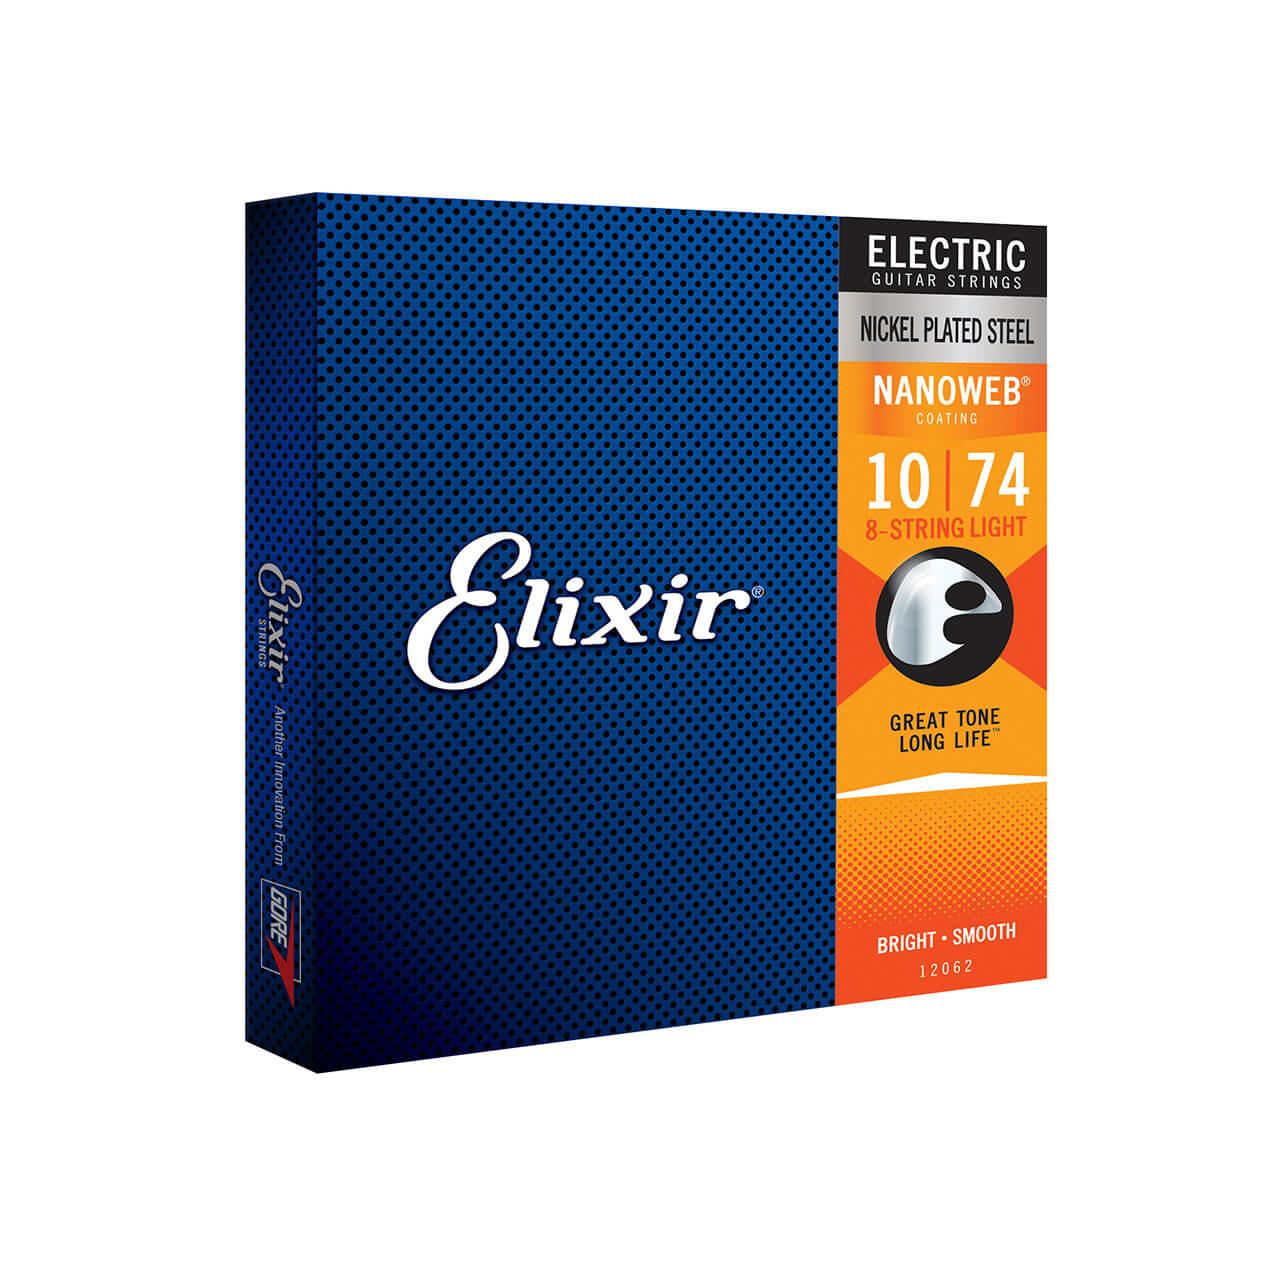 Encordoamento Elixir 010-74 Light Nanoweb Guitarra 8 Cordas  - GuitarParts Brasil